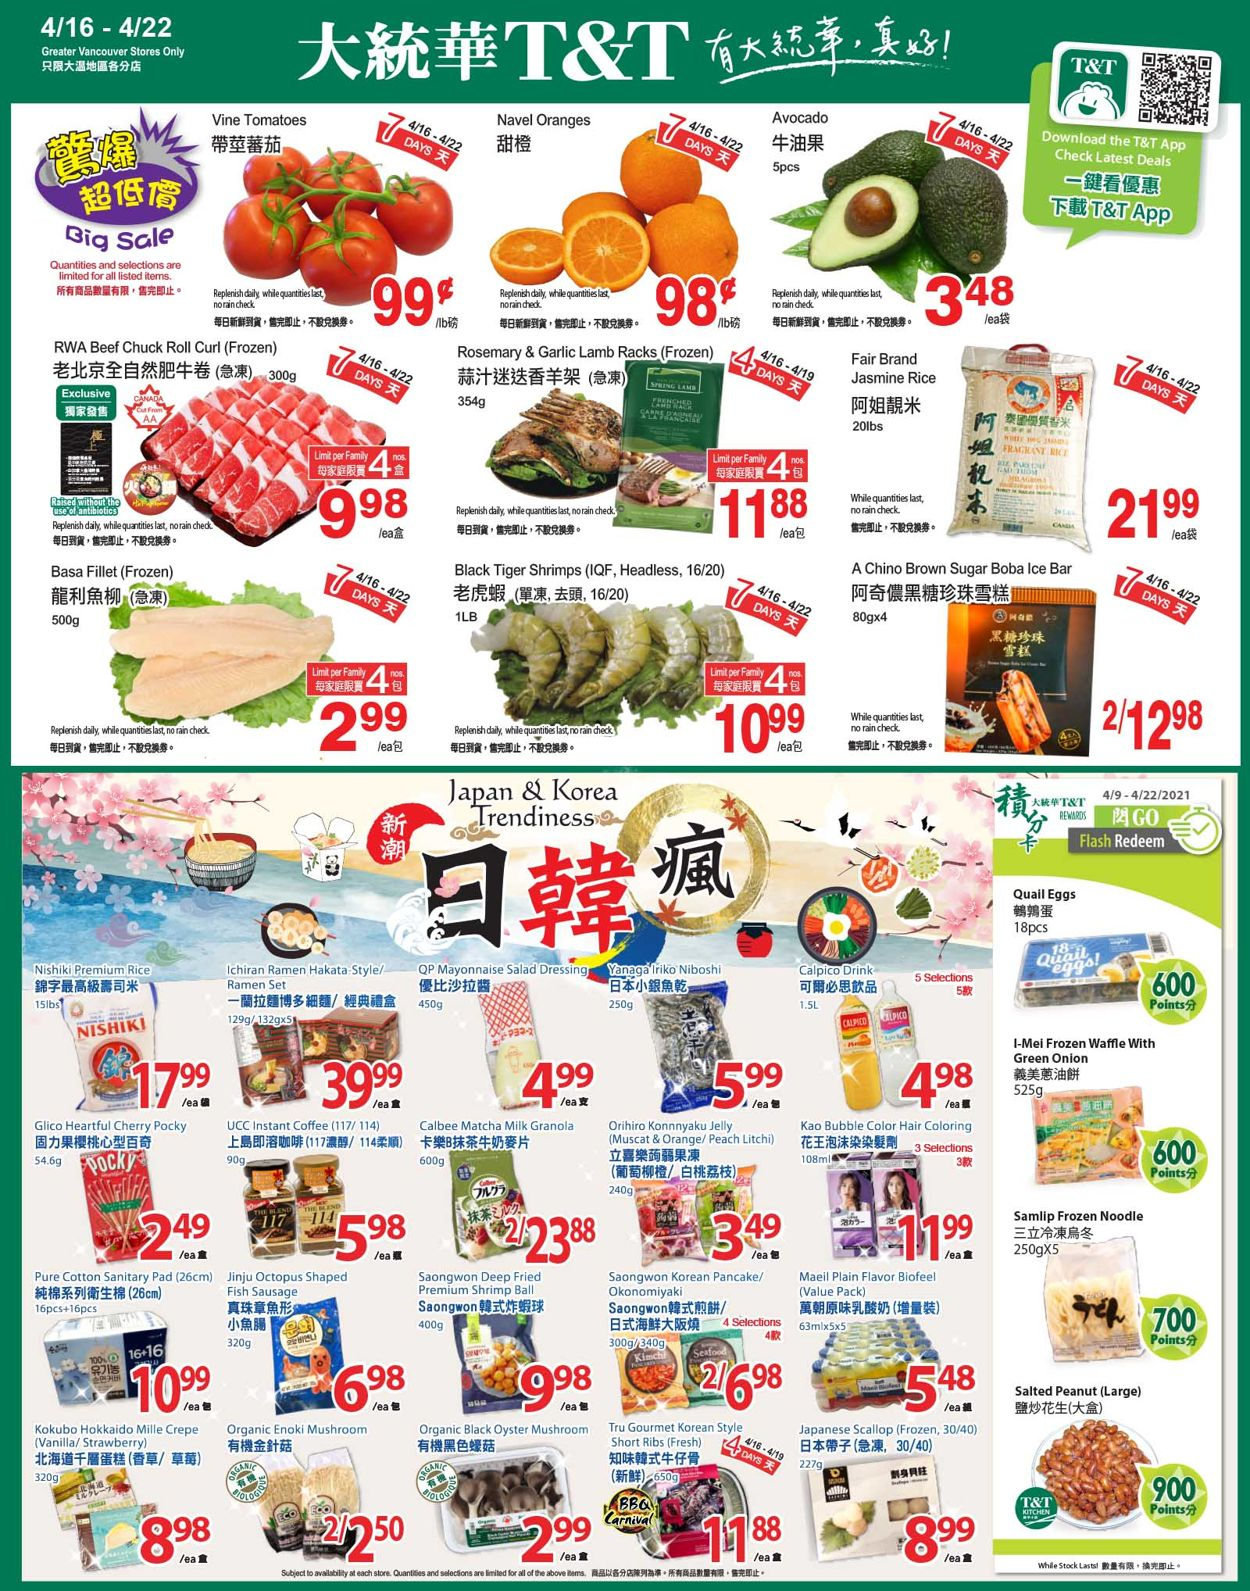 T&T Supermarket - British Columbia Flyer - 04/16-04/22/2021